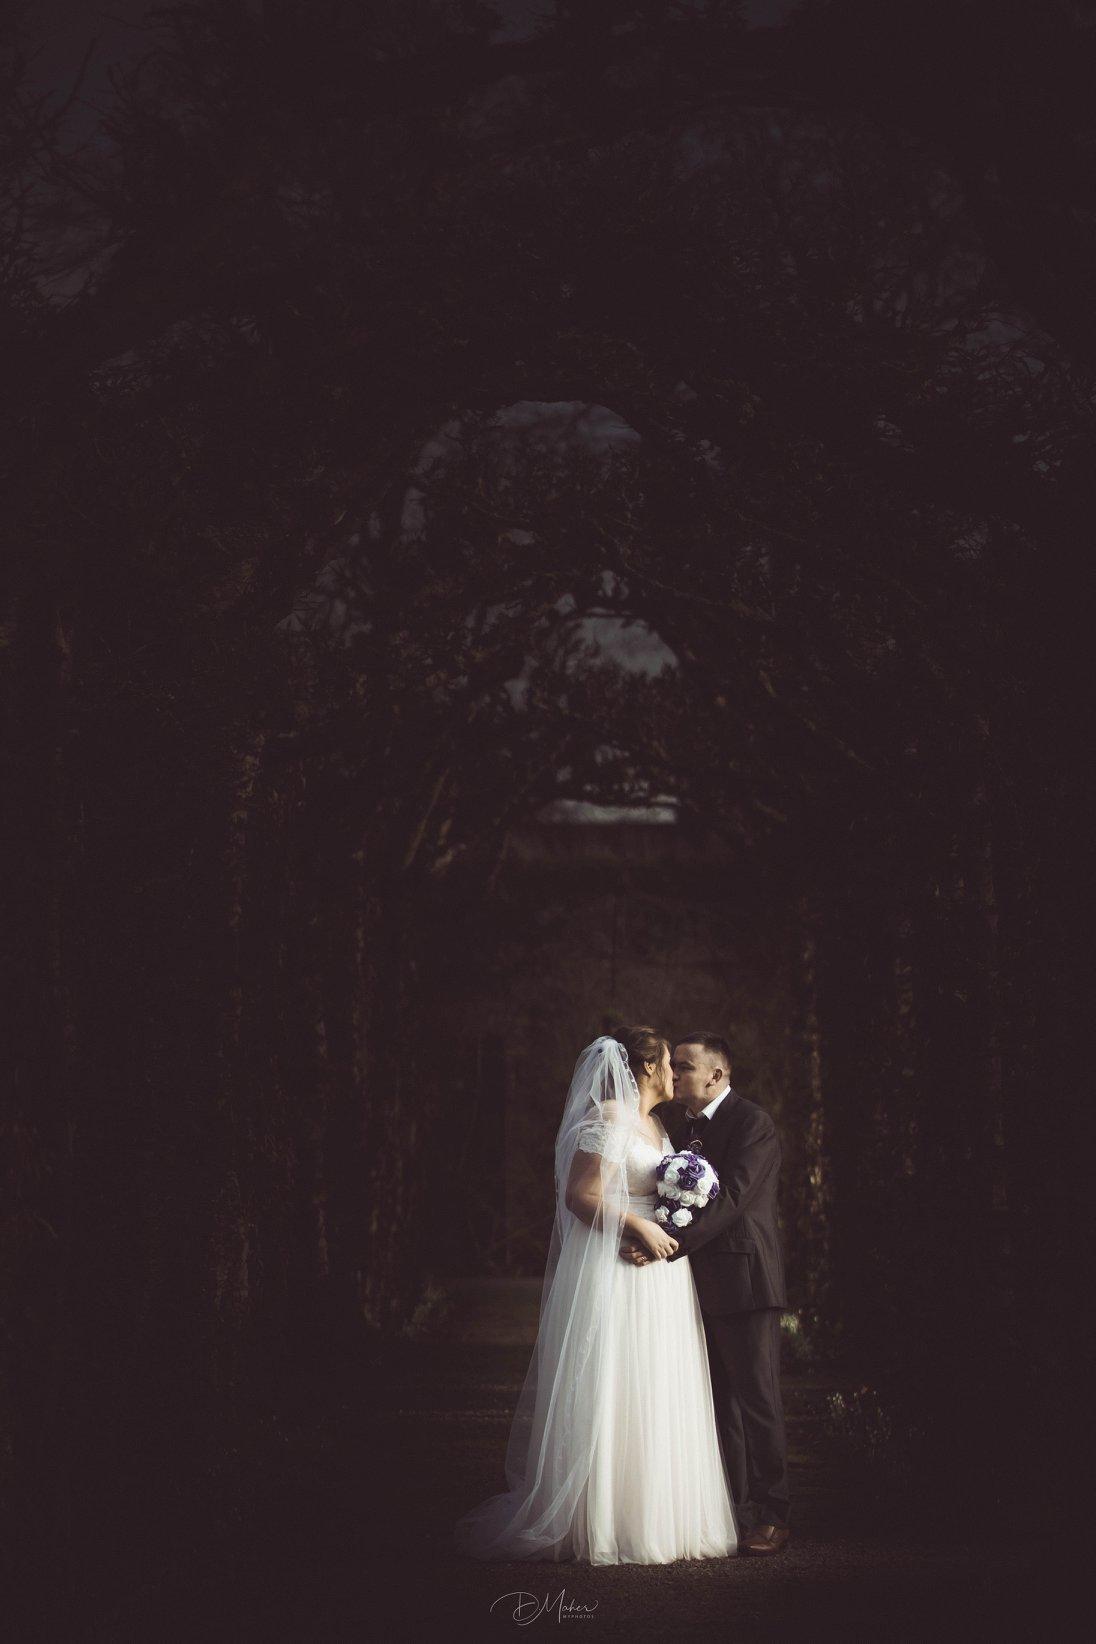 Darren-Maher-photography-ireland-22